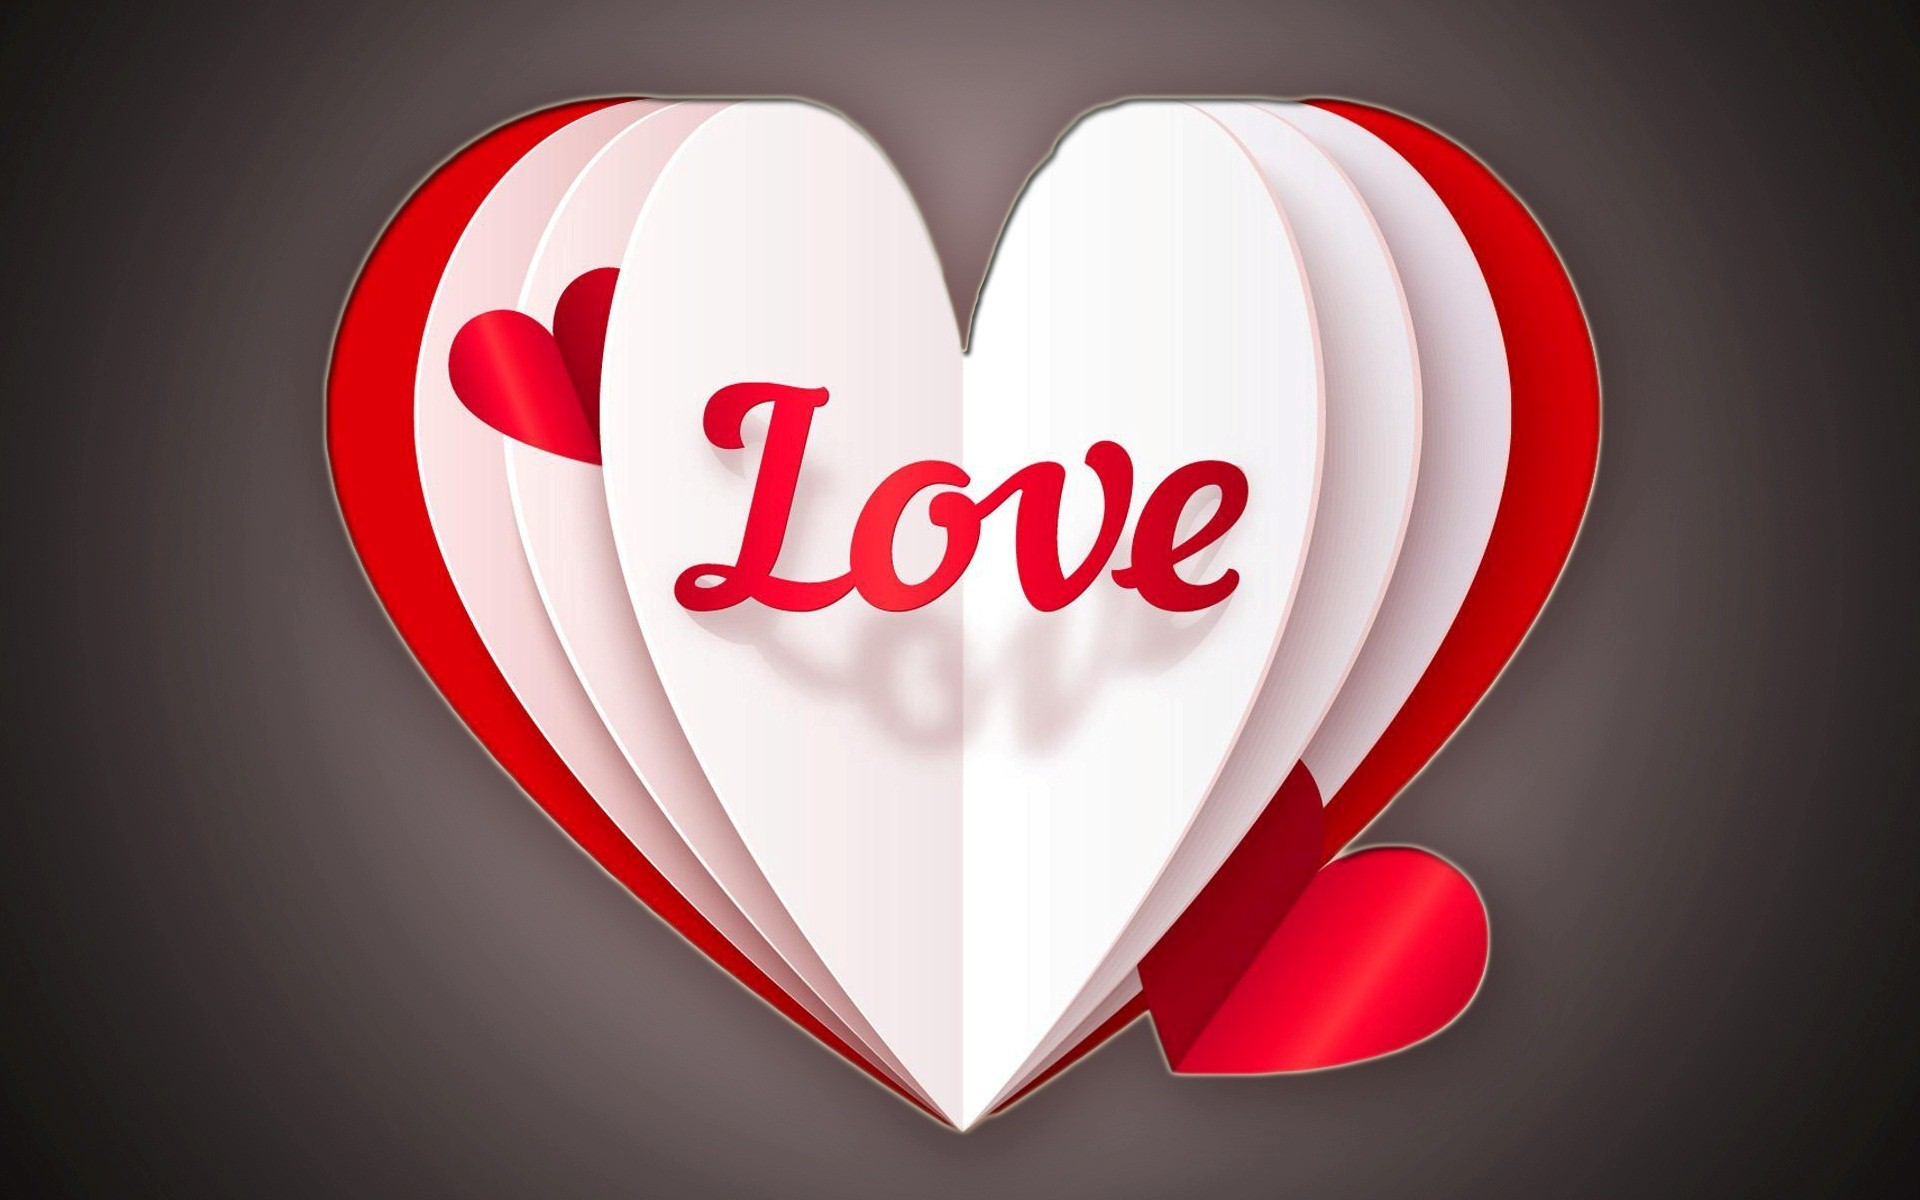 Love Heart Wallpaper 60 images 1920x1200